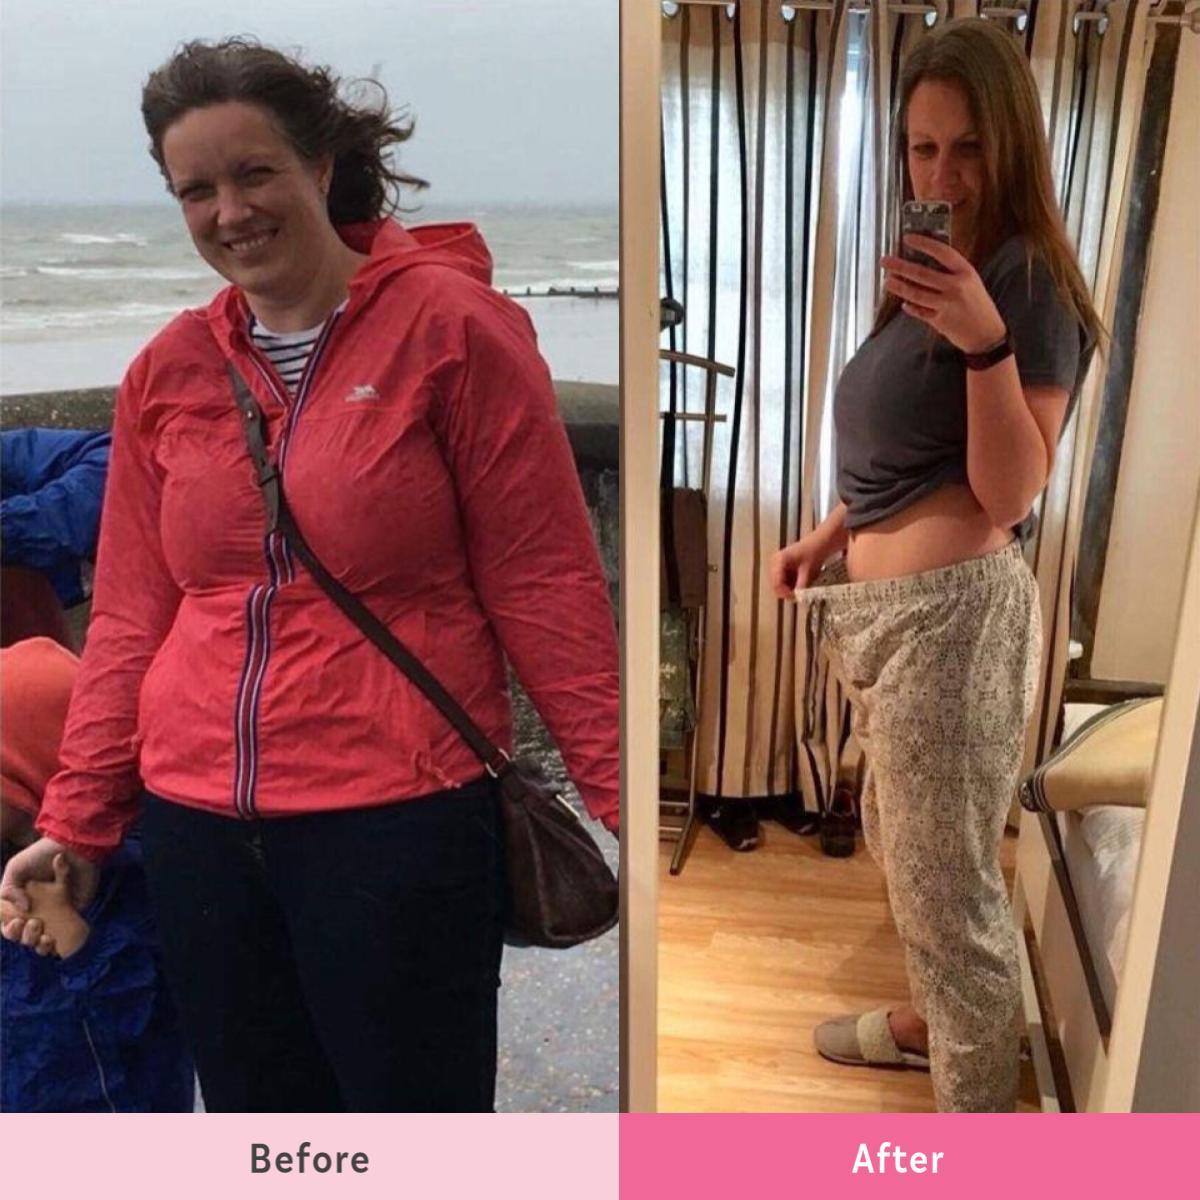 Jenni Hayward's transformation